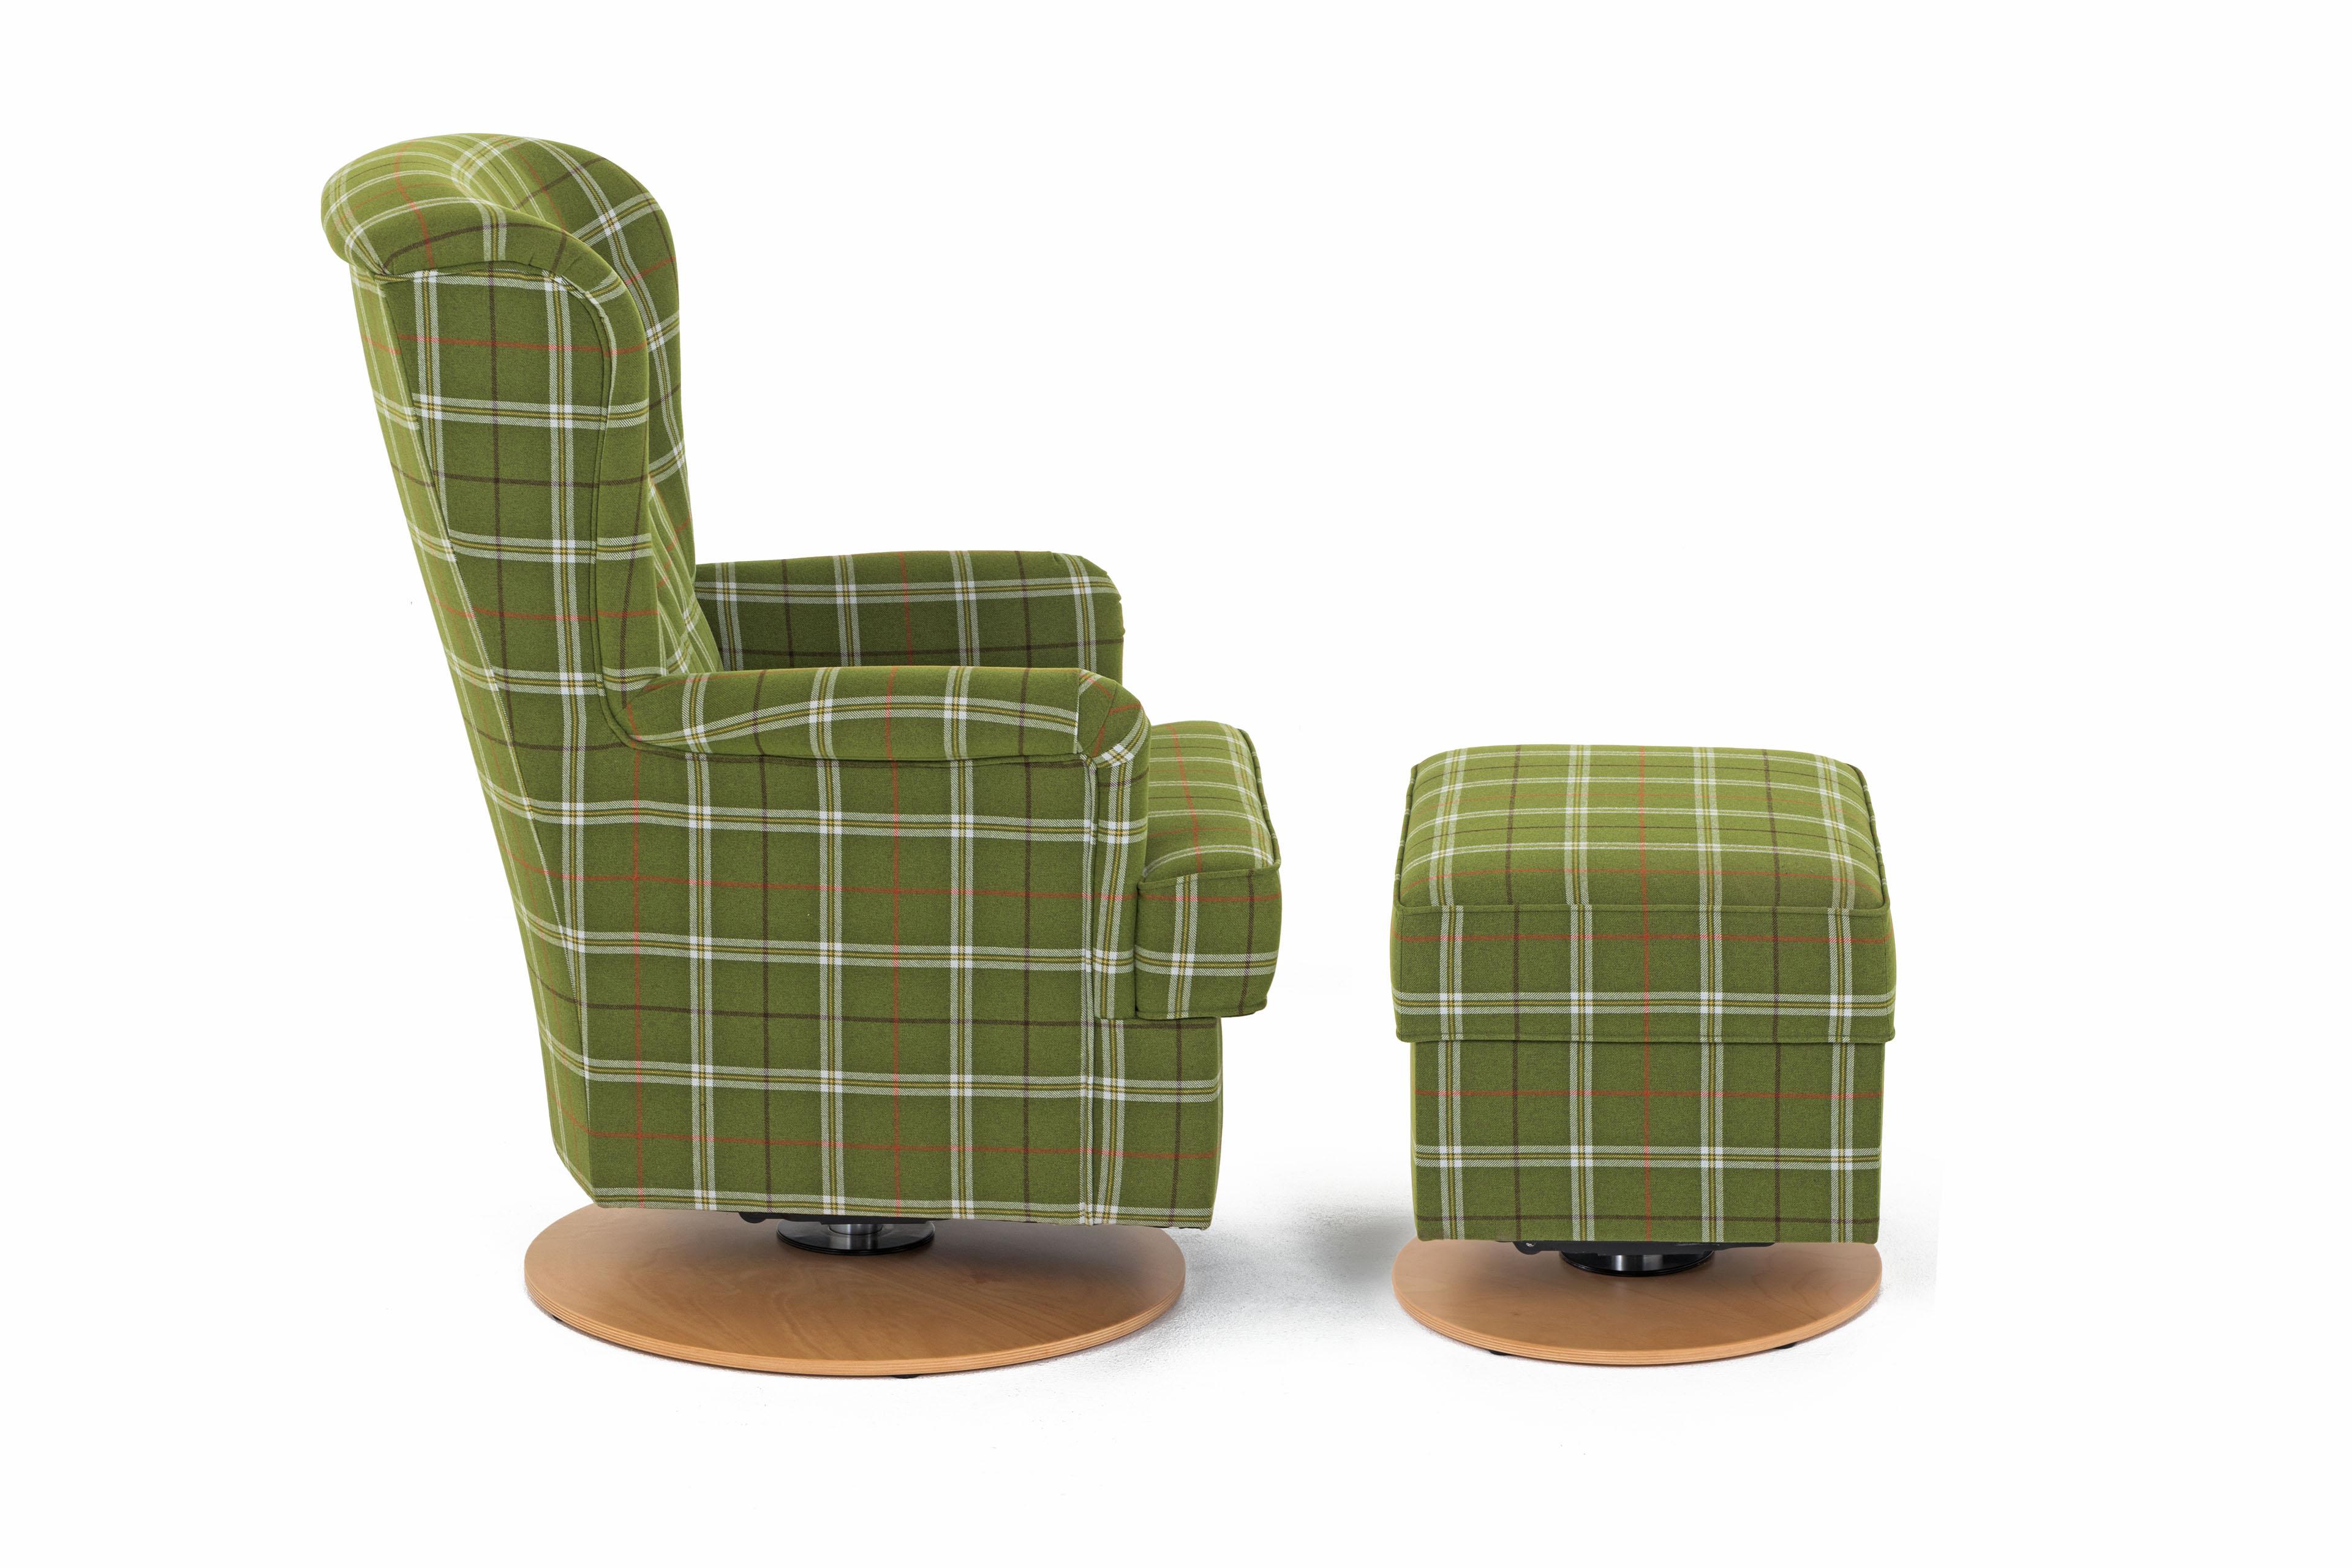 ohrenbackensessel grun alles ber wohndesign und m belideen. Black Bedroom Furniture Sets. Home Design Ideas